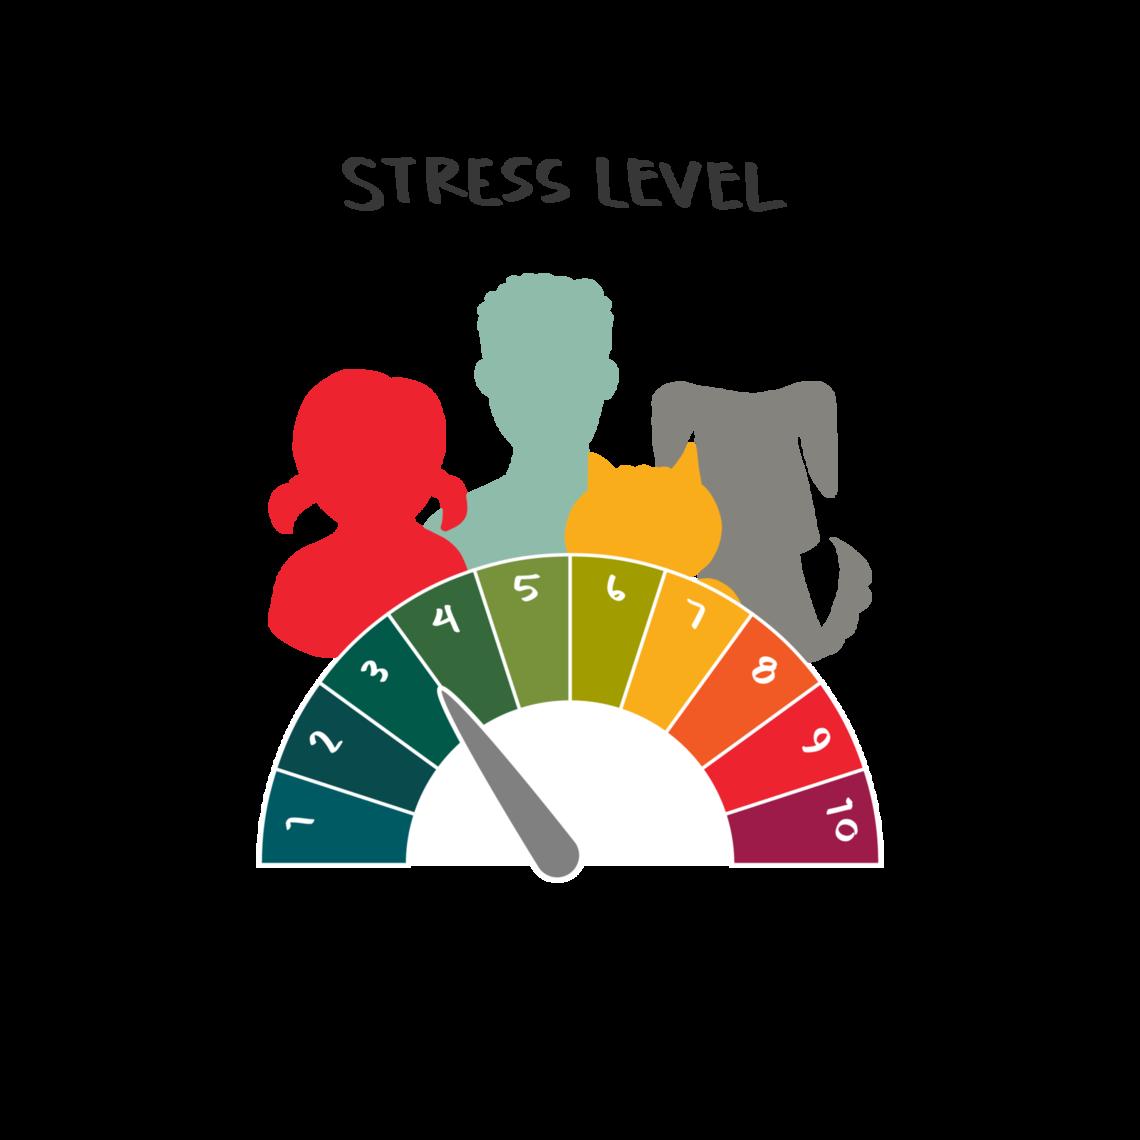 mindshield exercise 8 source w stress level